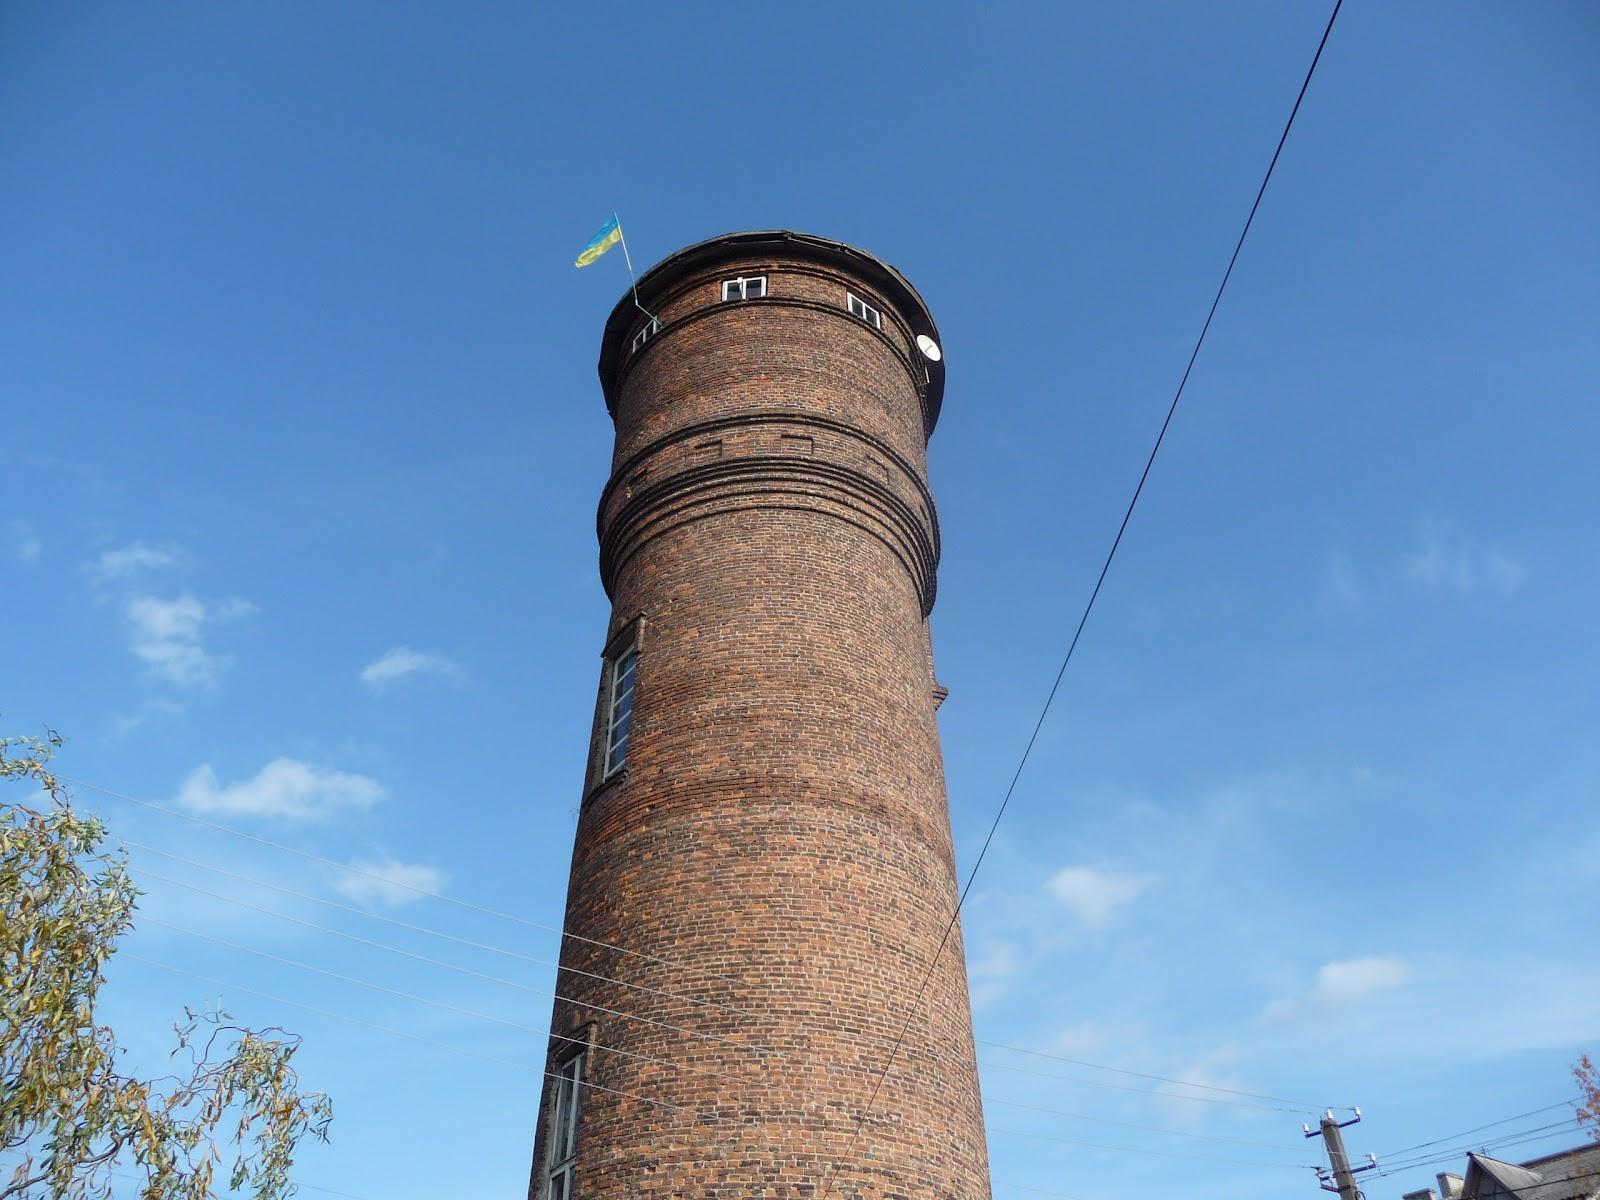 Угерско. Водонапорная башня